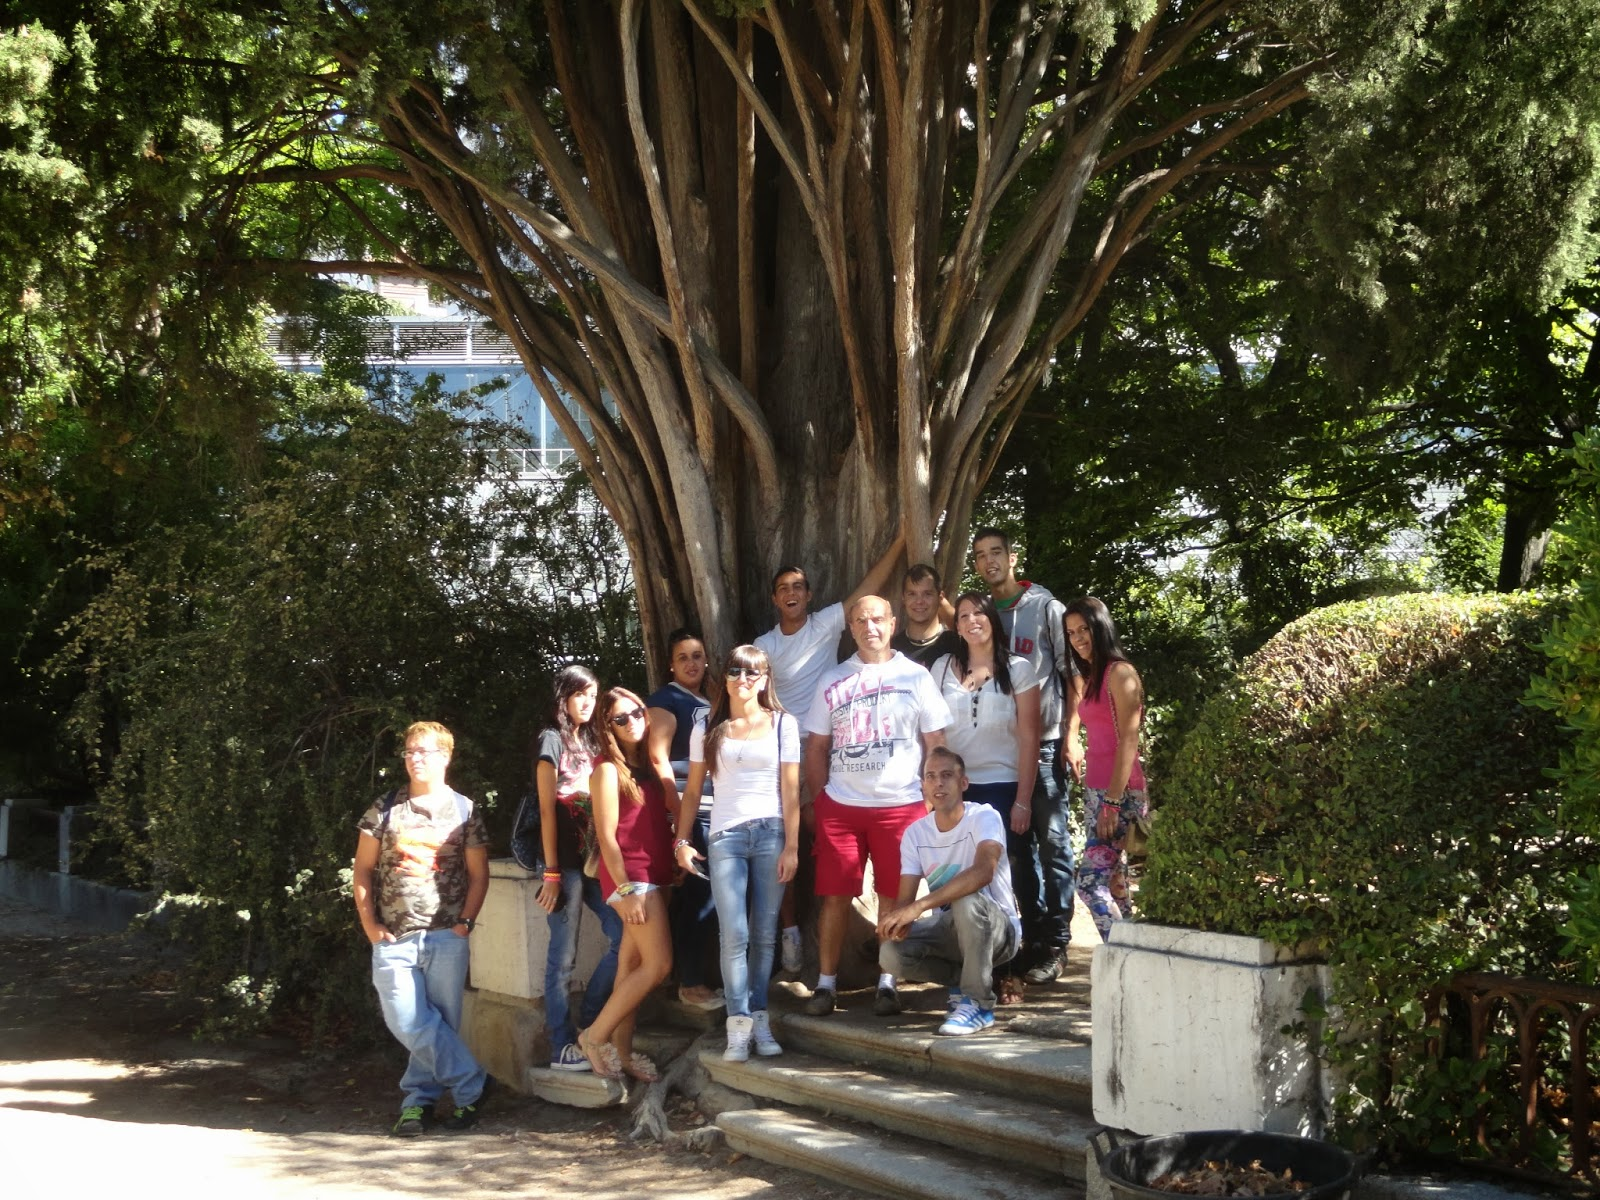 Escuela taller vicente paredes x jardin bot nico for Talleres jardin botanico